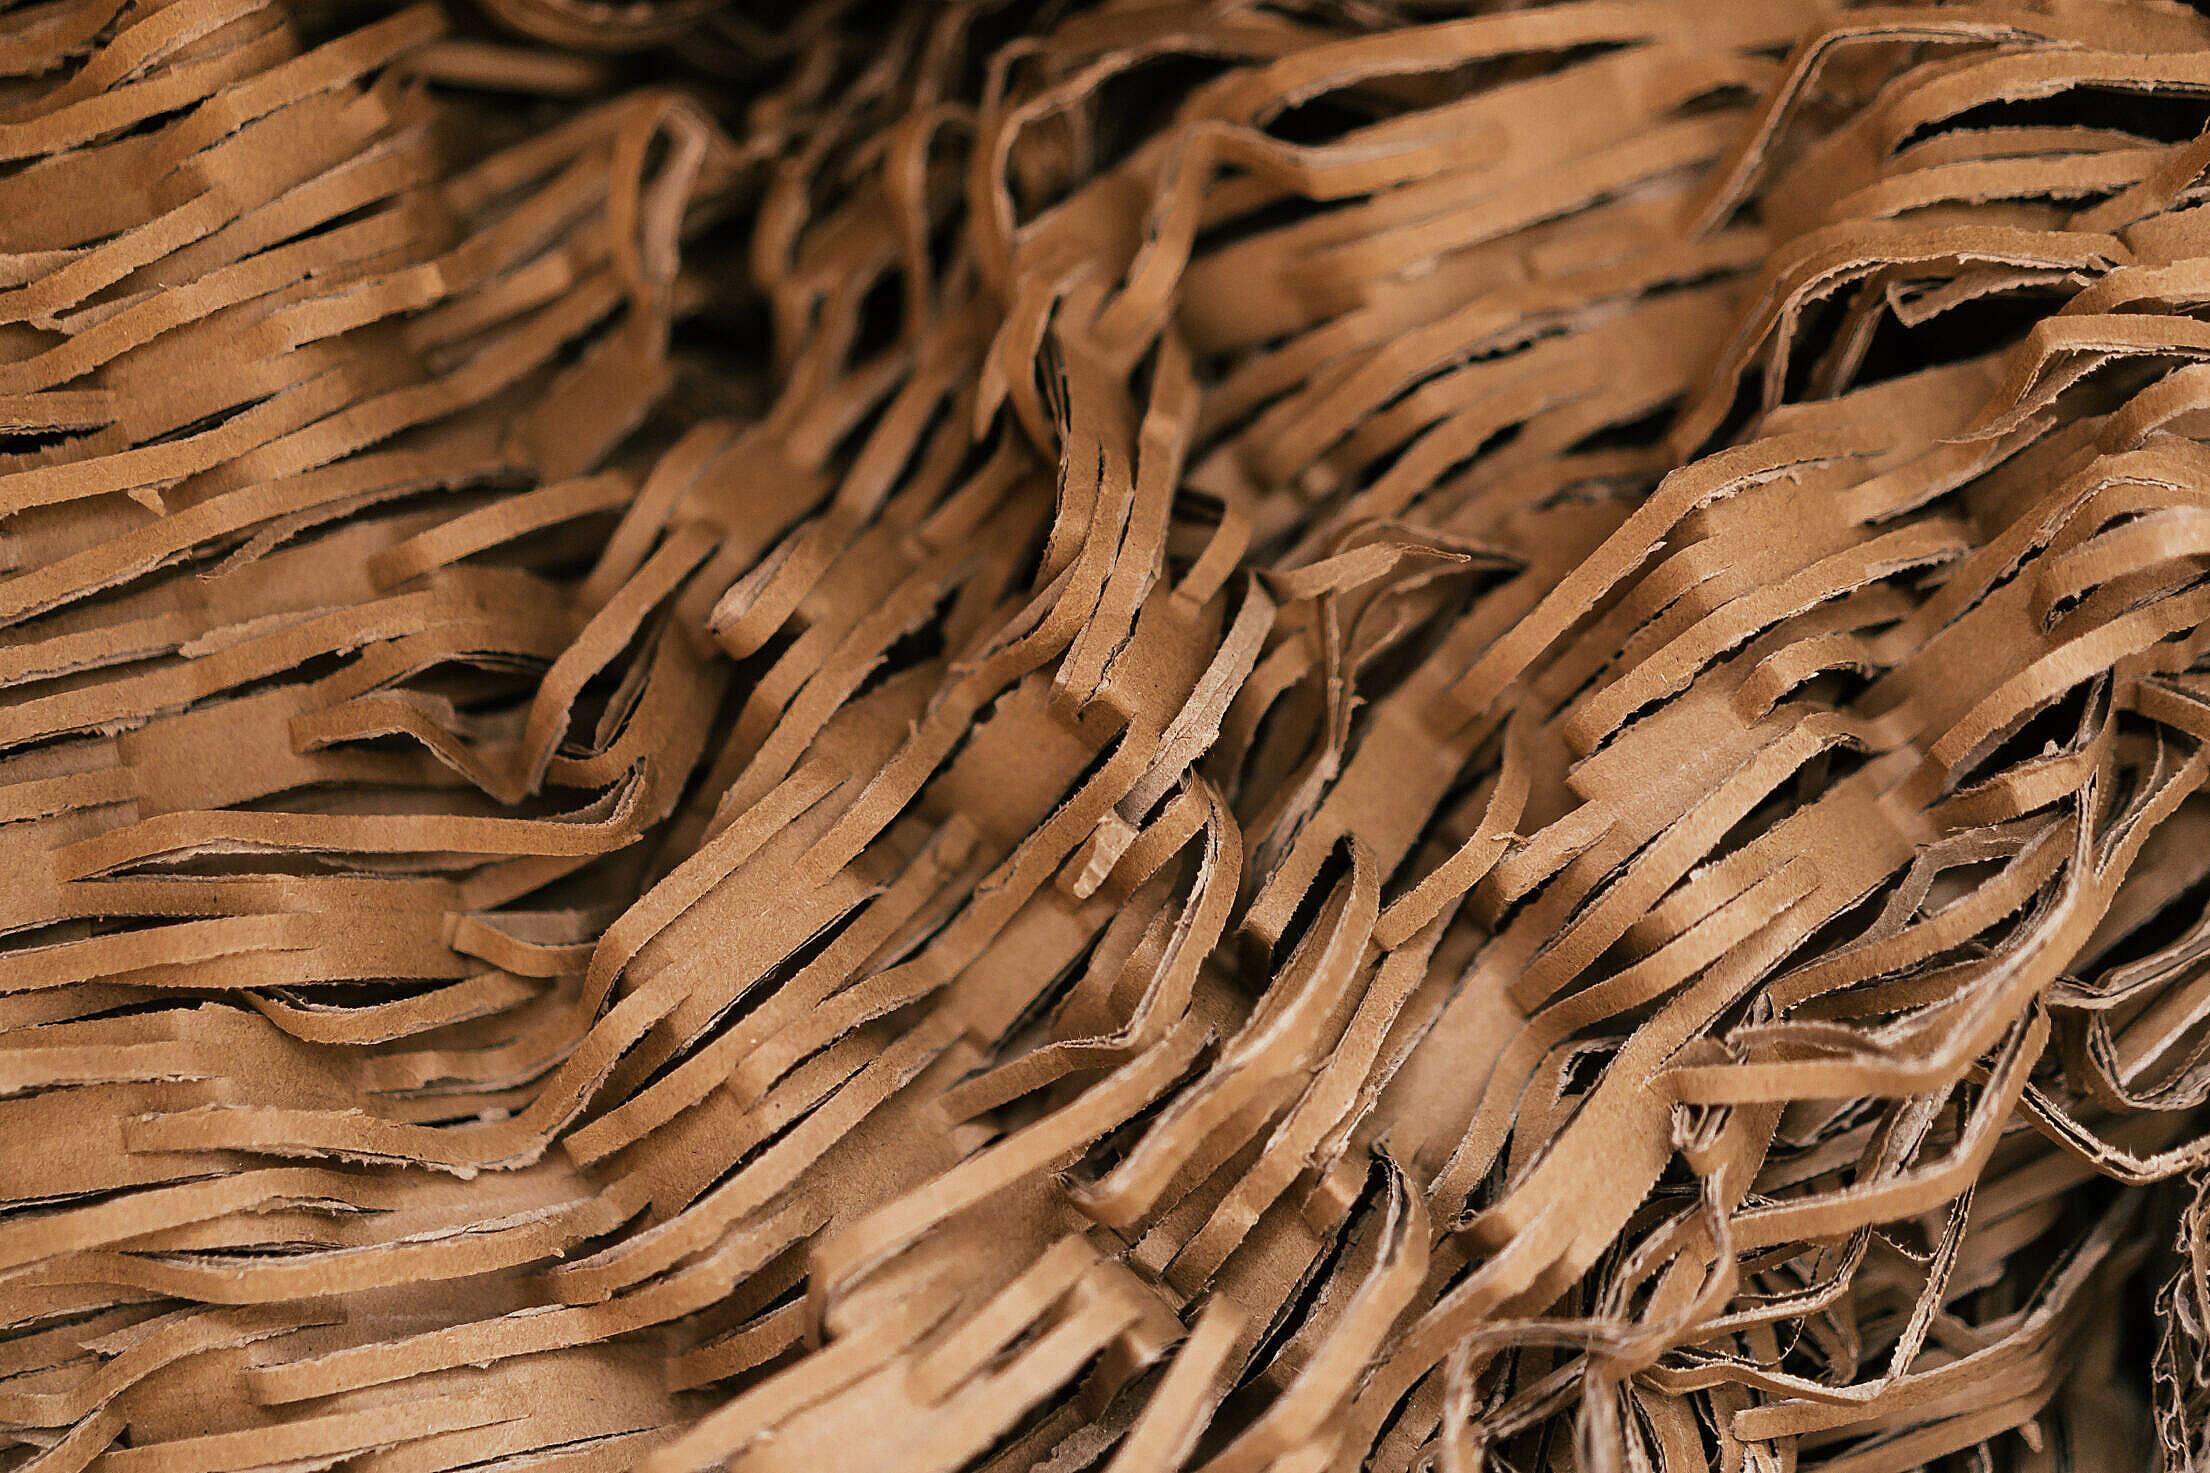 Shredded Cardboard Filling Free Stock Photo